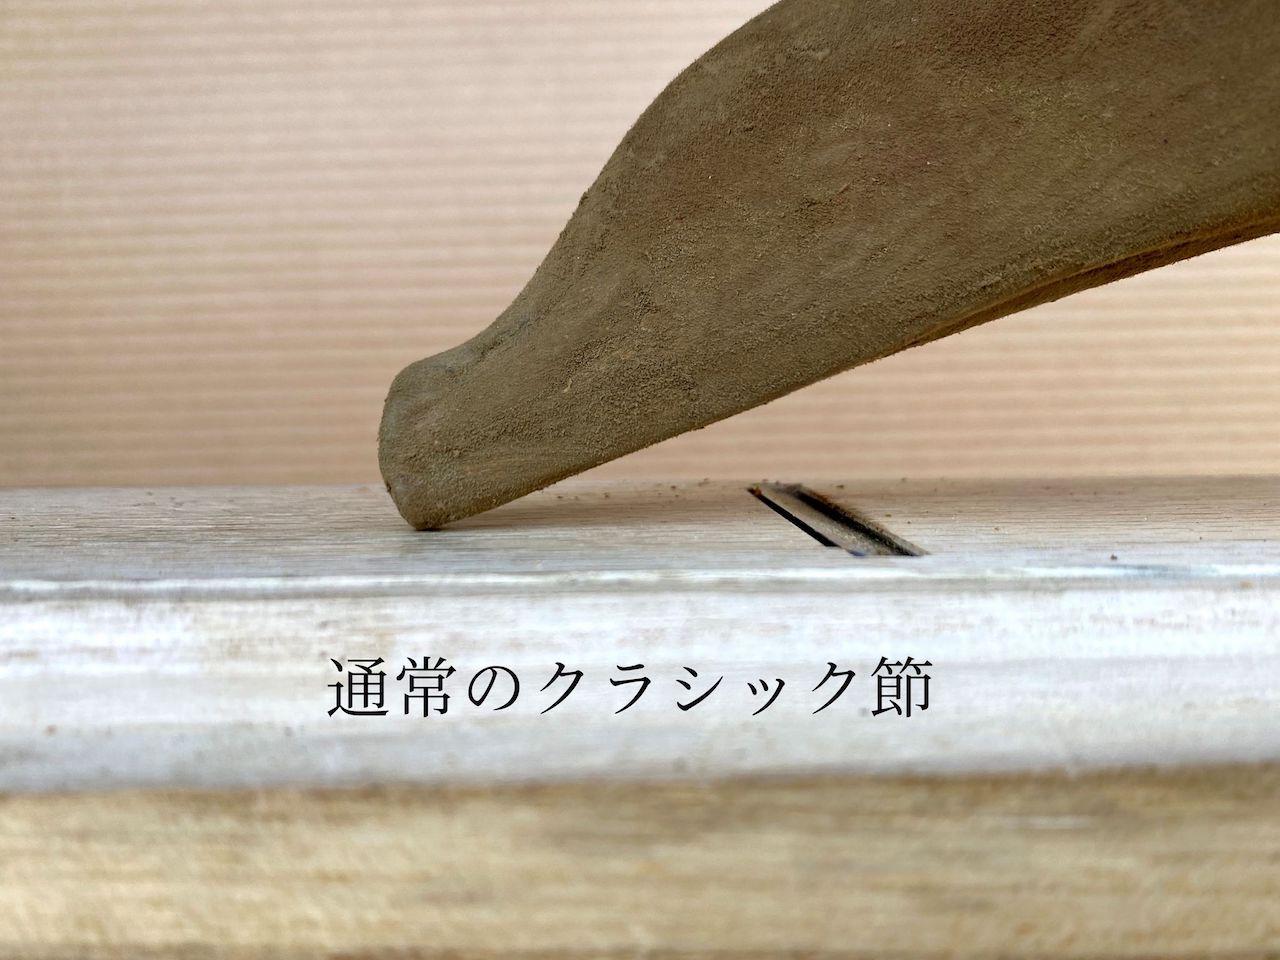 《New》 本枯節CLASSIC-BUSHI  【斬】 ー 男節・女節 2本入り (大) ー 【遠洋一本釣り鰹使用】